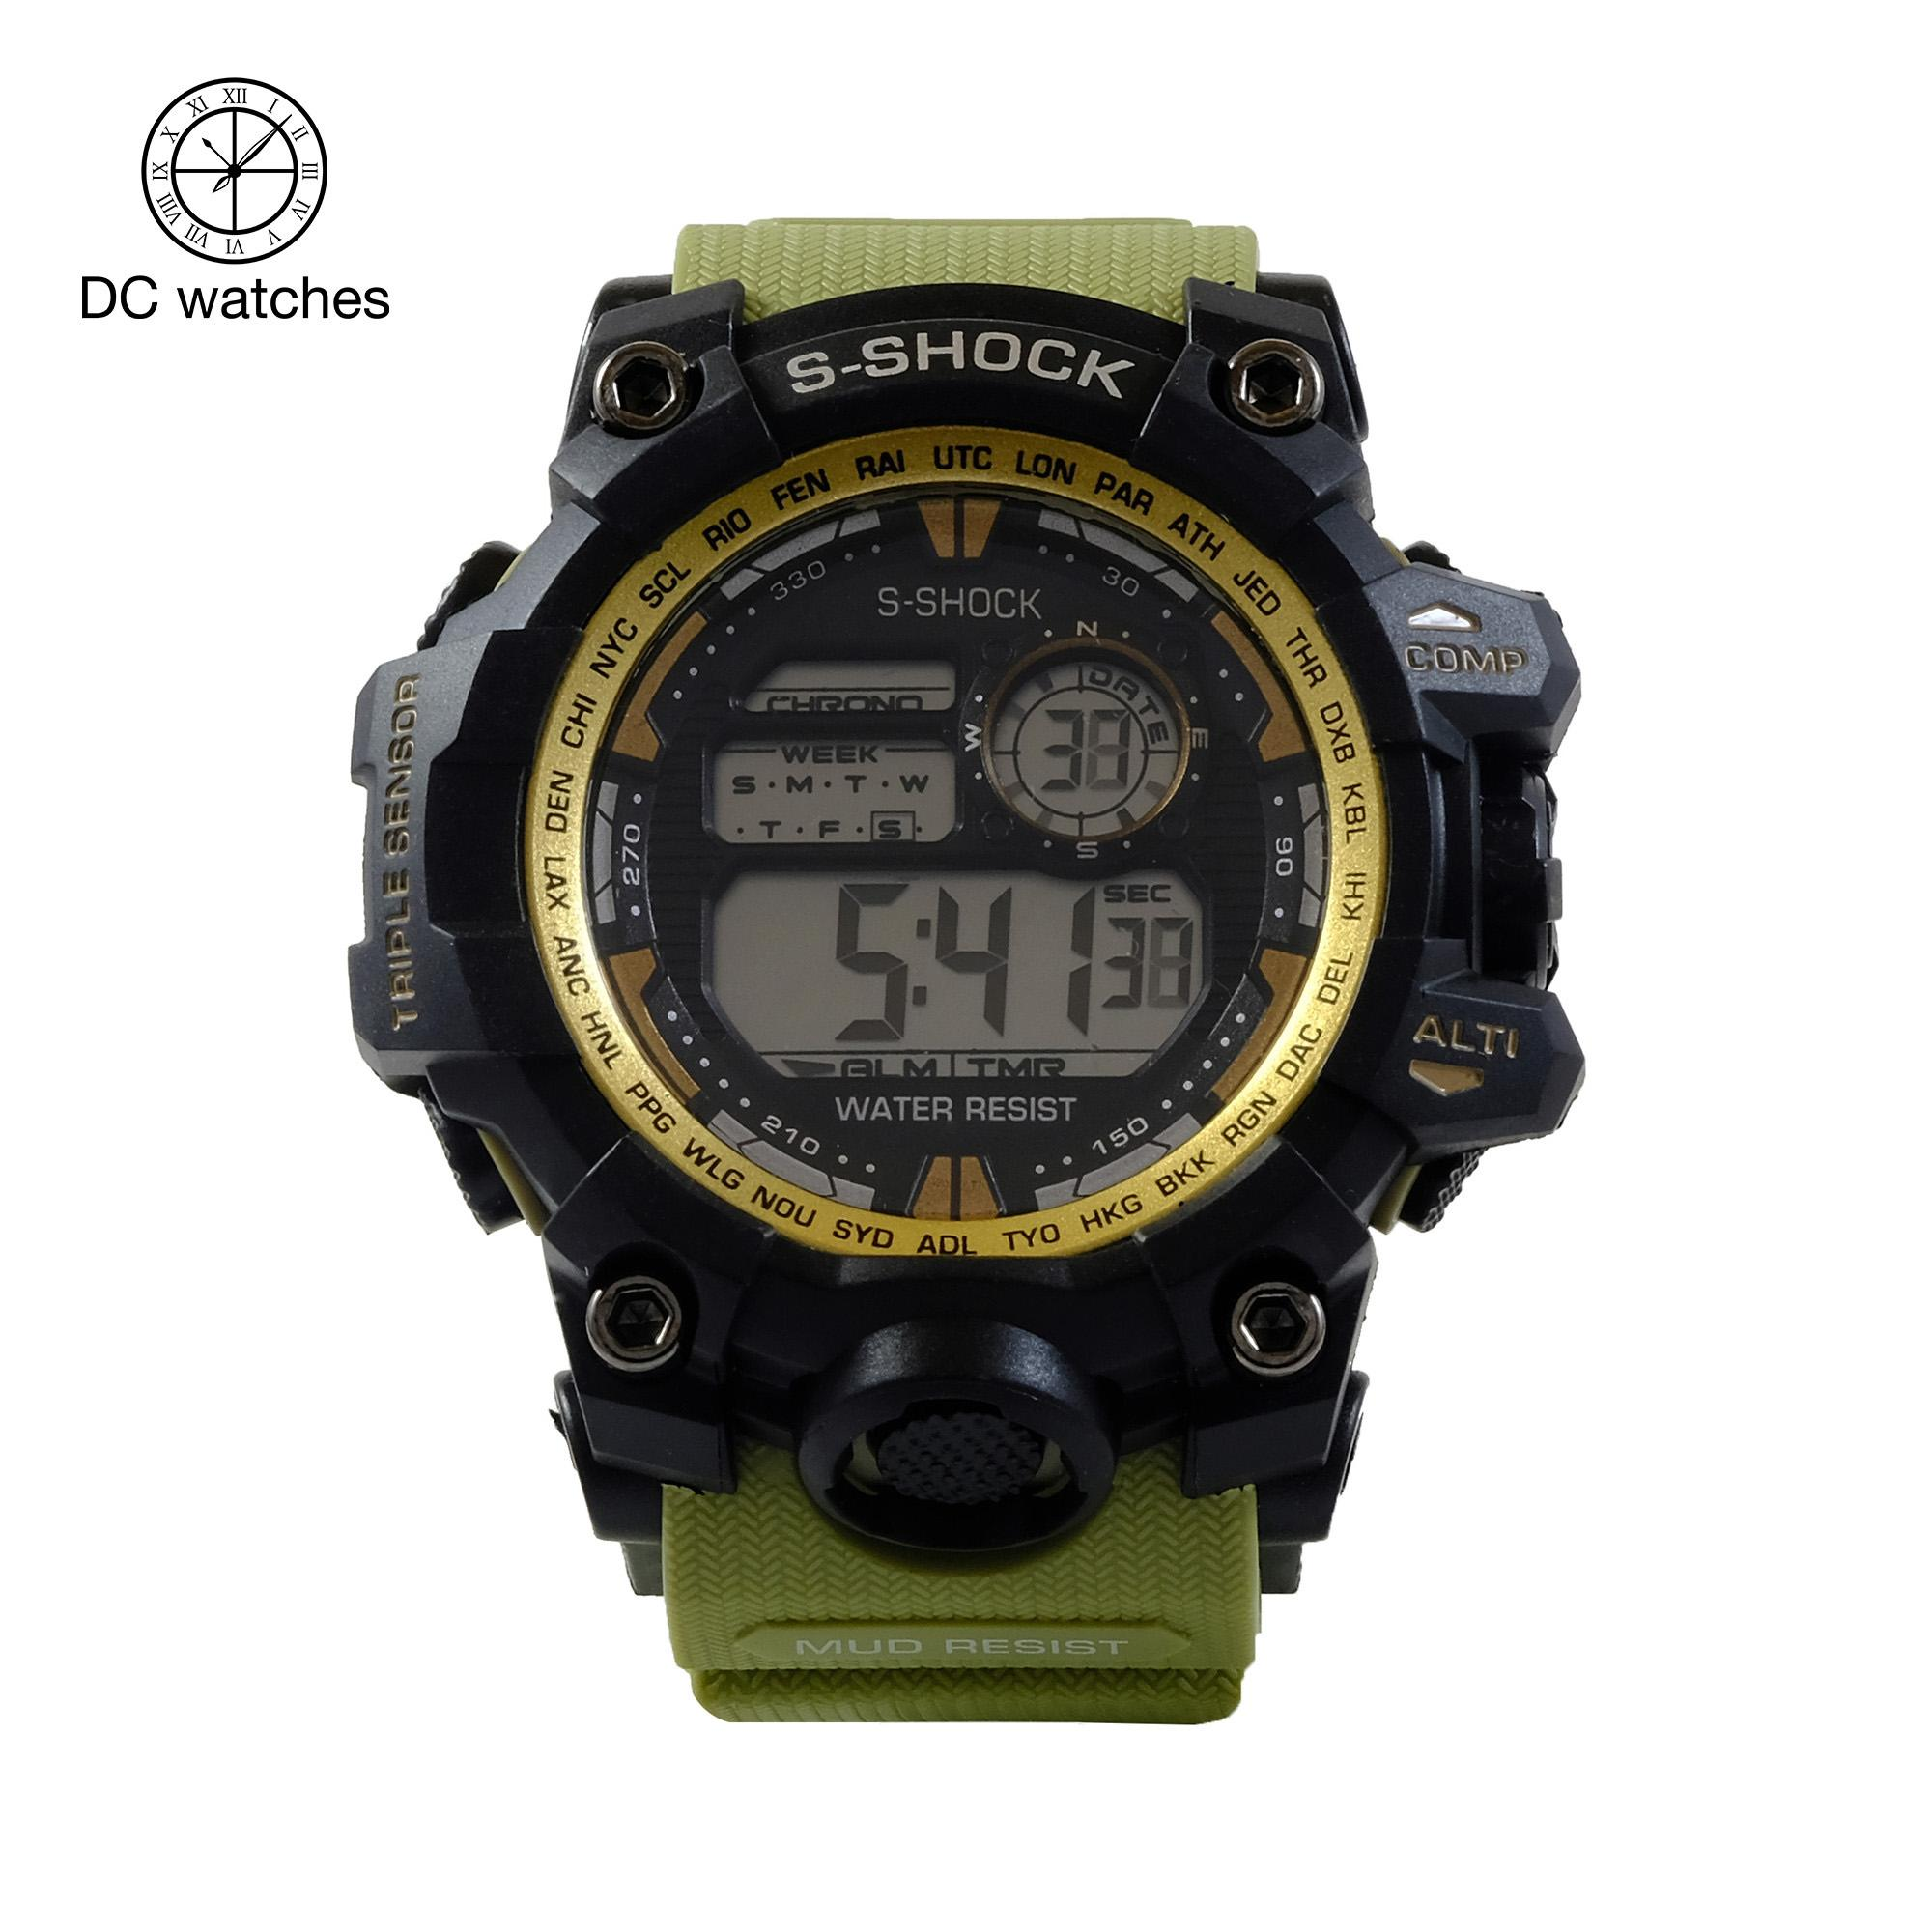 DC Watches watch for men korean fashion sports WATERPROOF digital watch  9977 collection